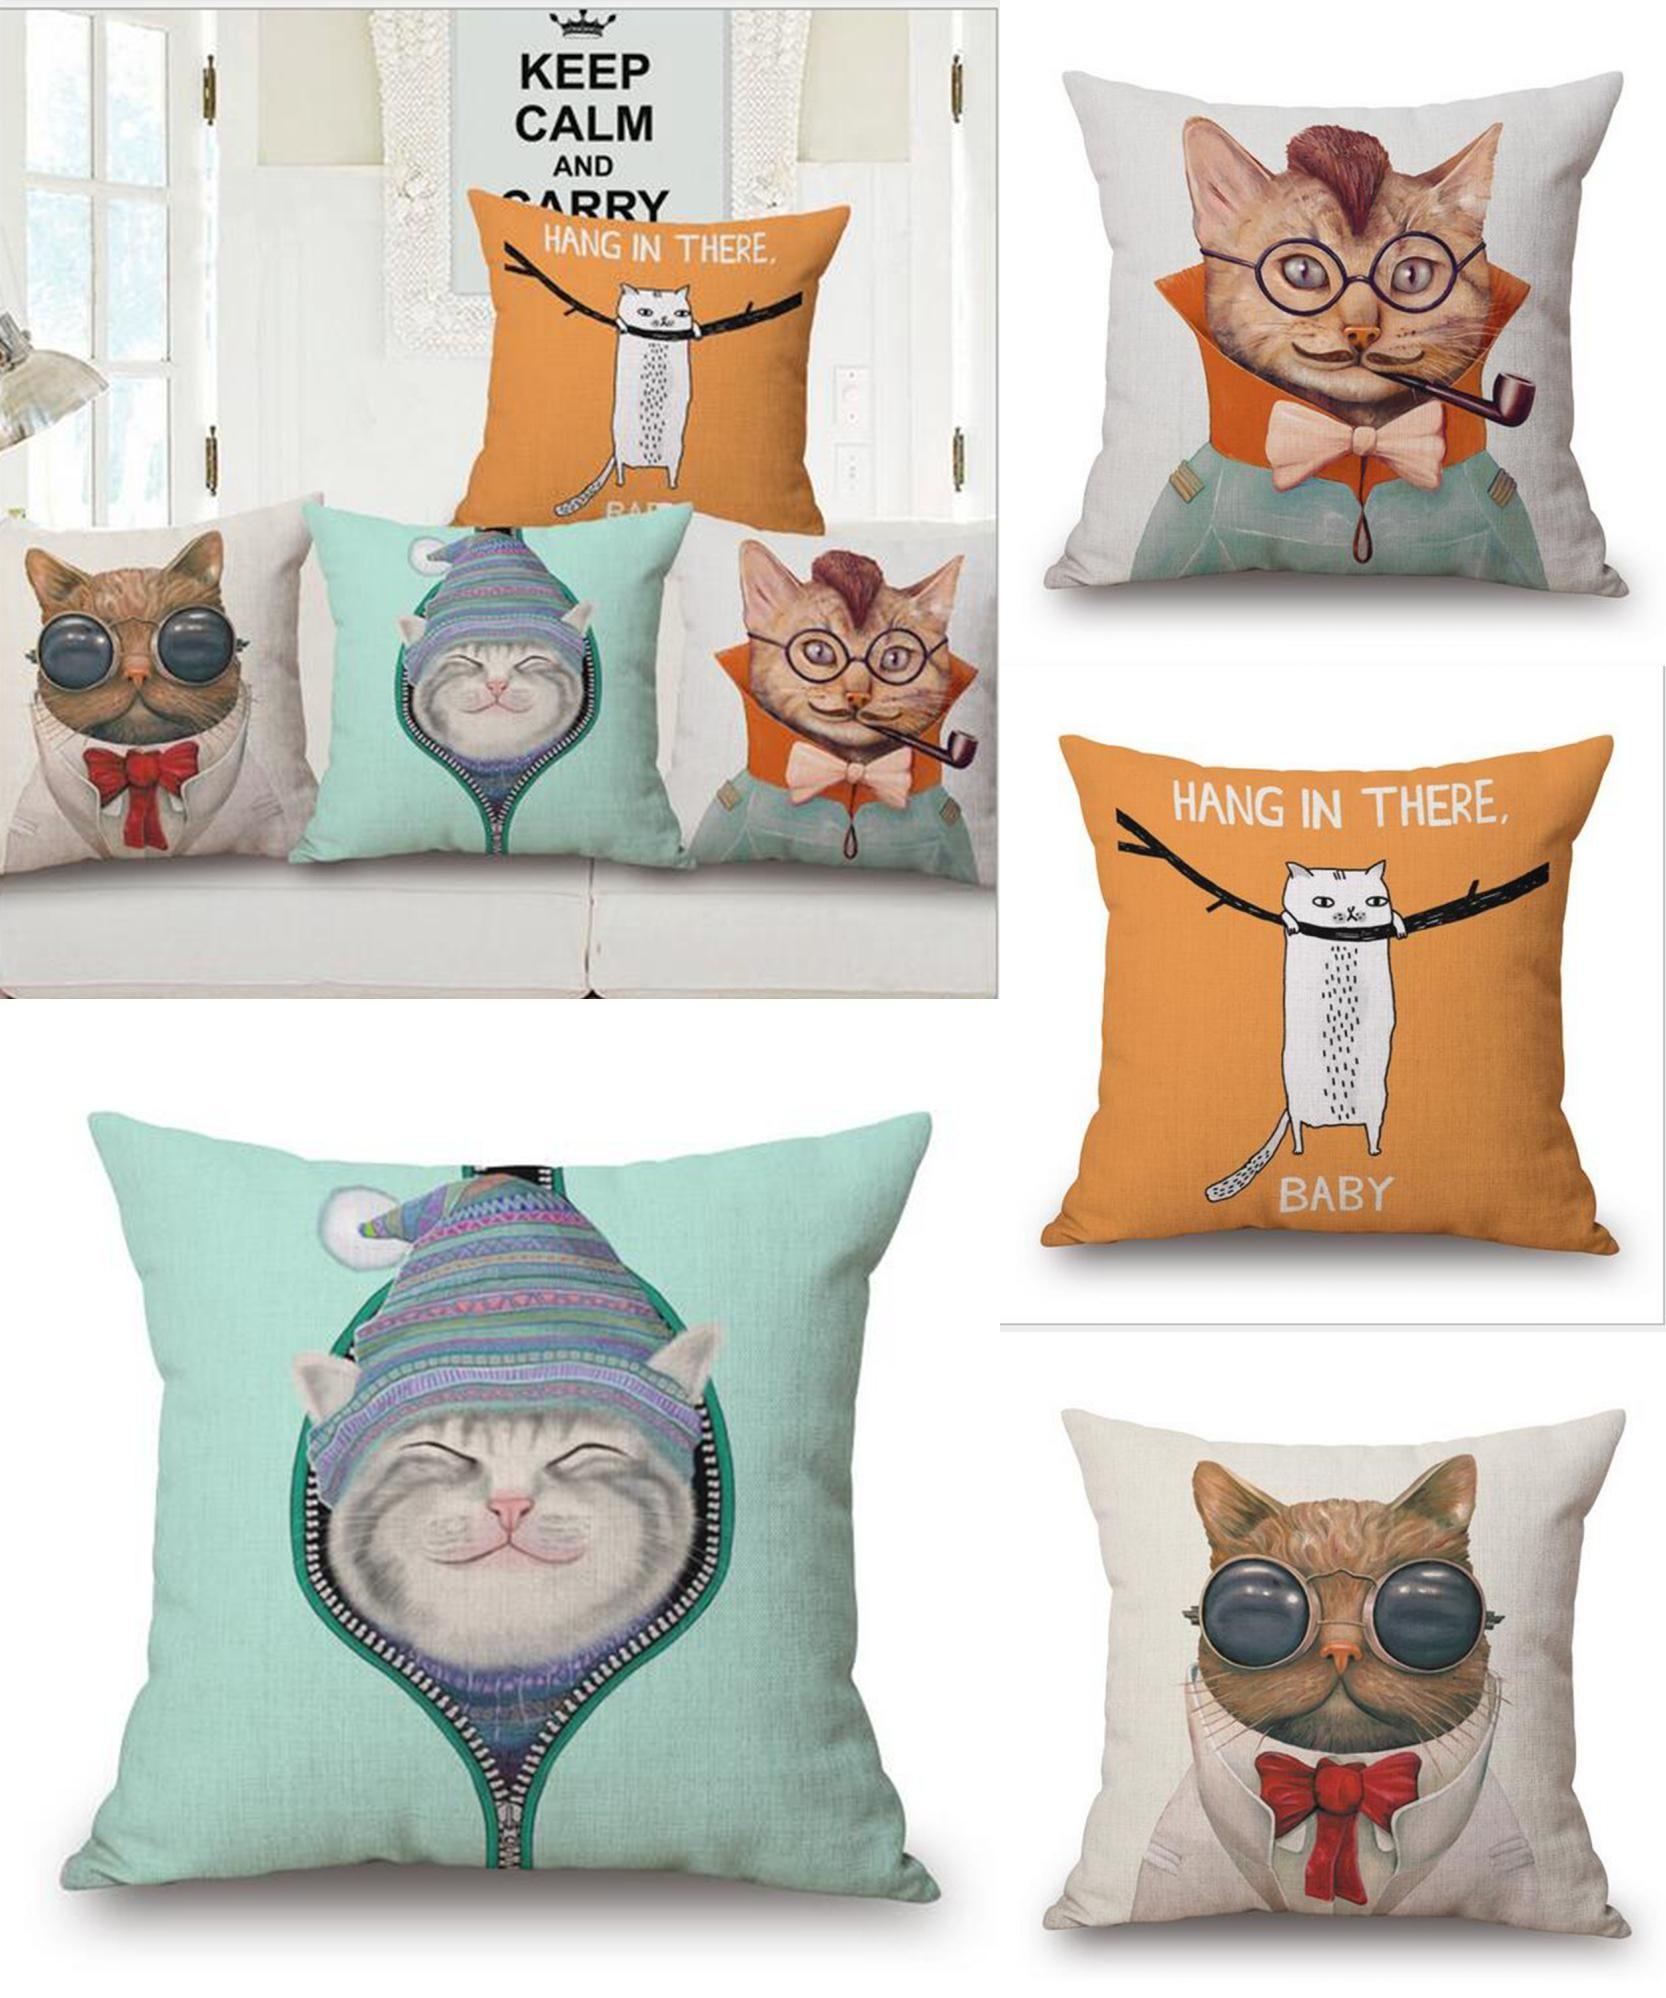 Visit to Buy] Cute Pillow Cats Cushion Throw Pillow Cartoon ...